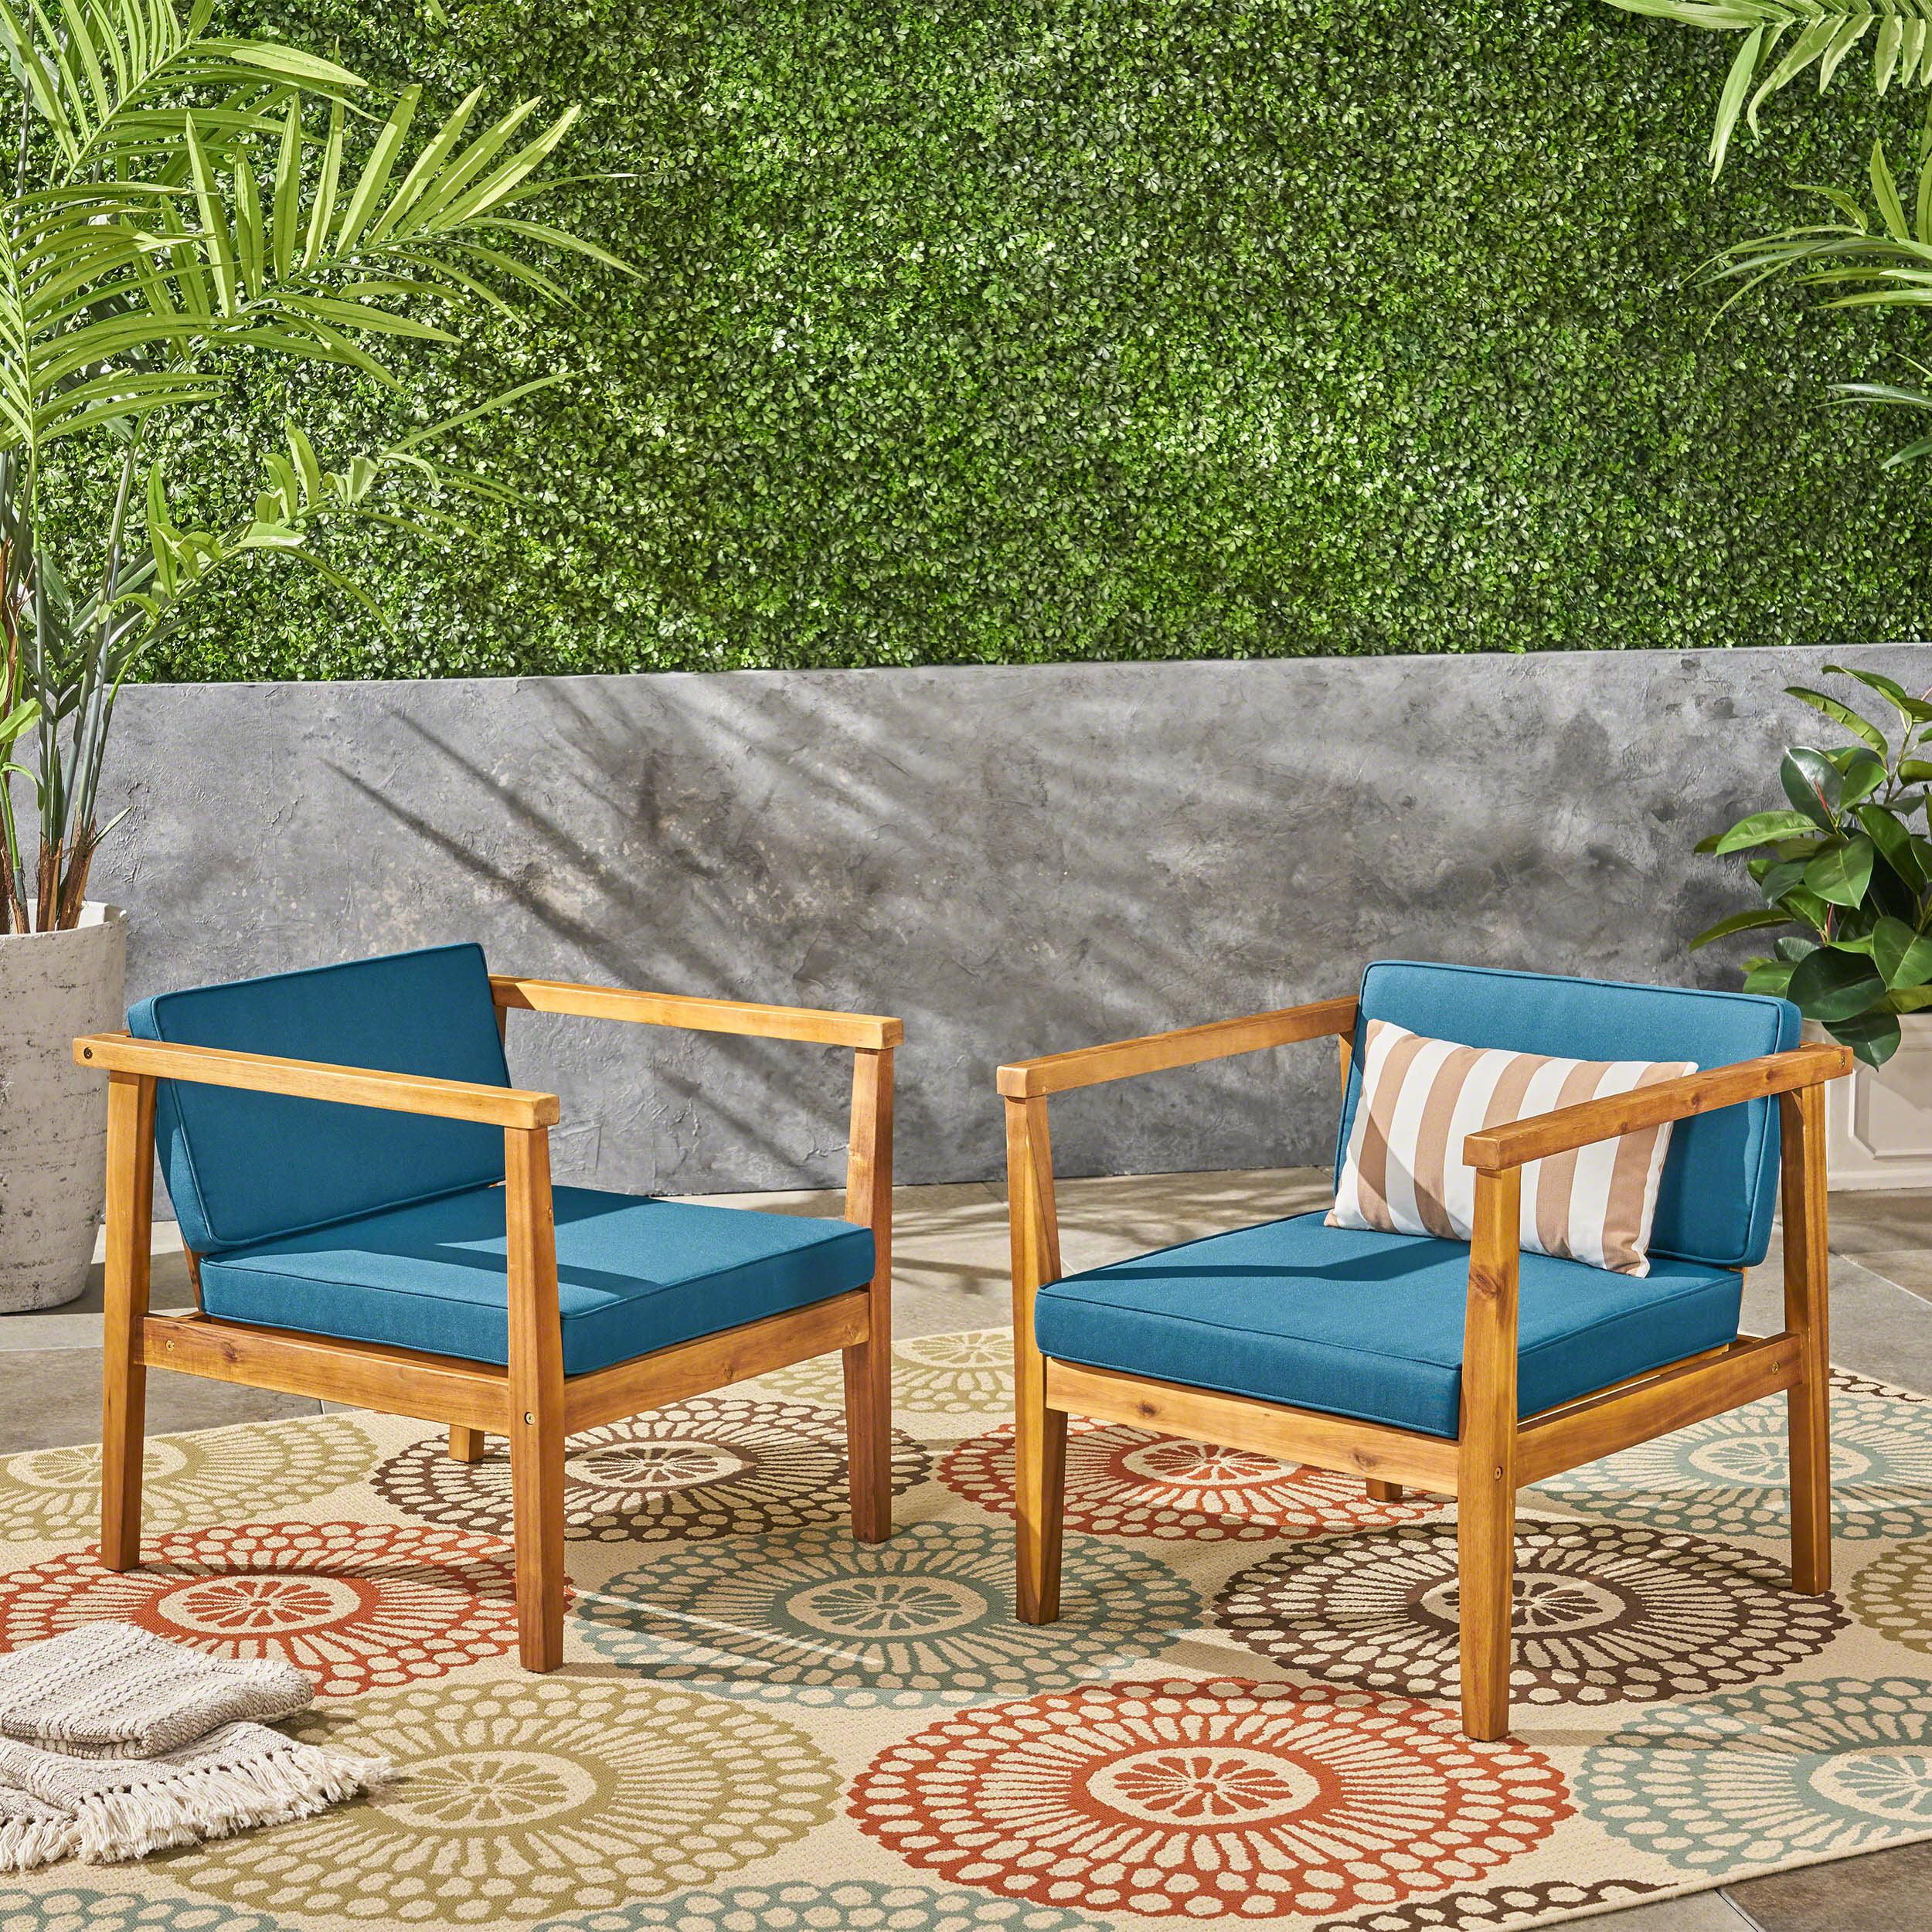 Newbury Outdoor Acacia Wood Club Chairs with Cushions, Set of 2, Teak, Dark Teal